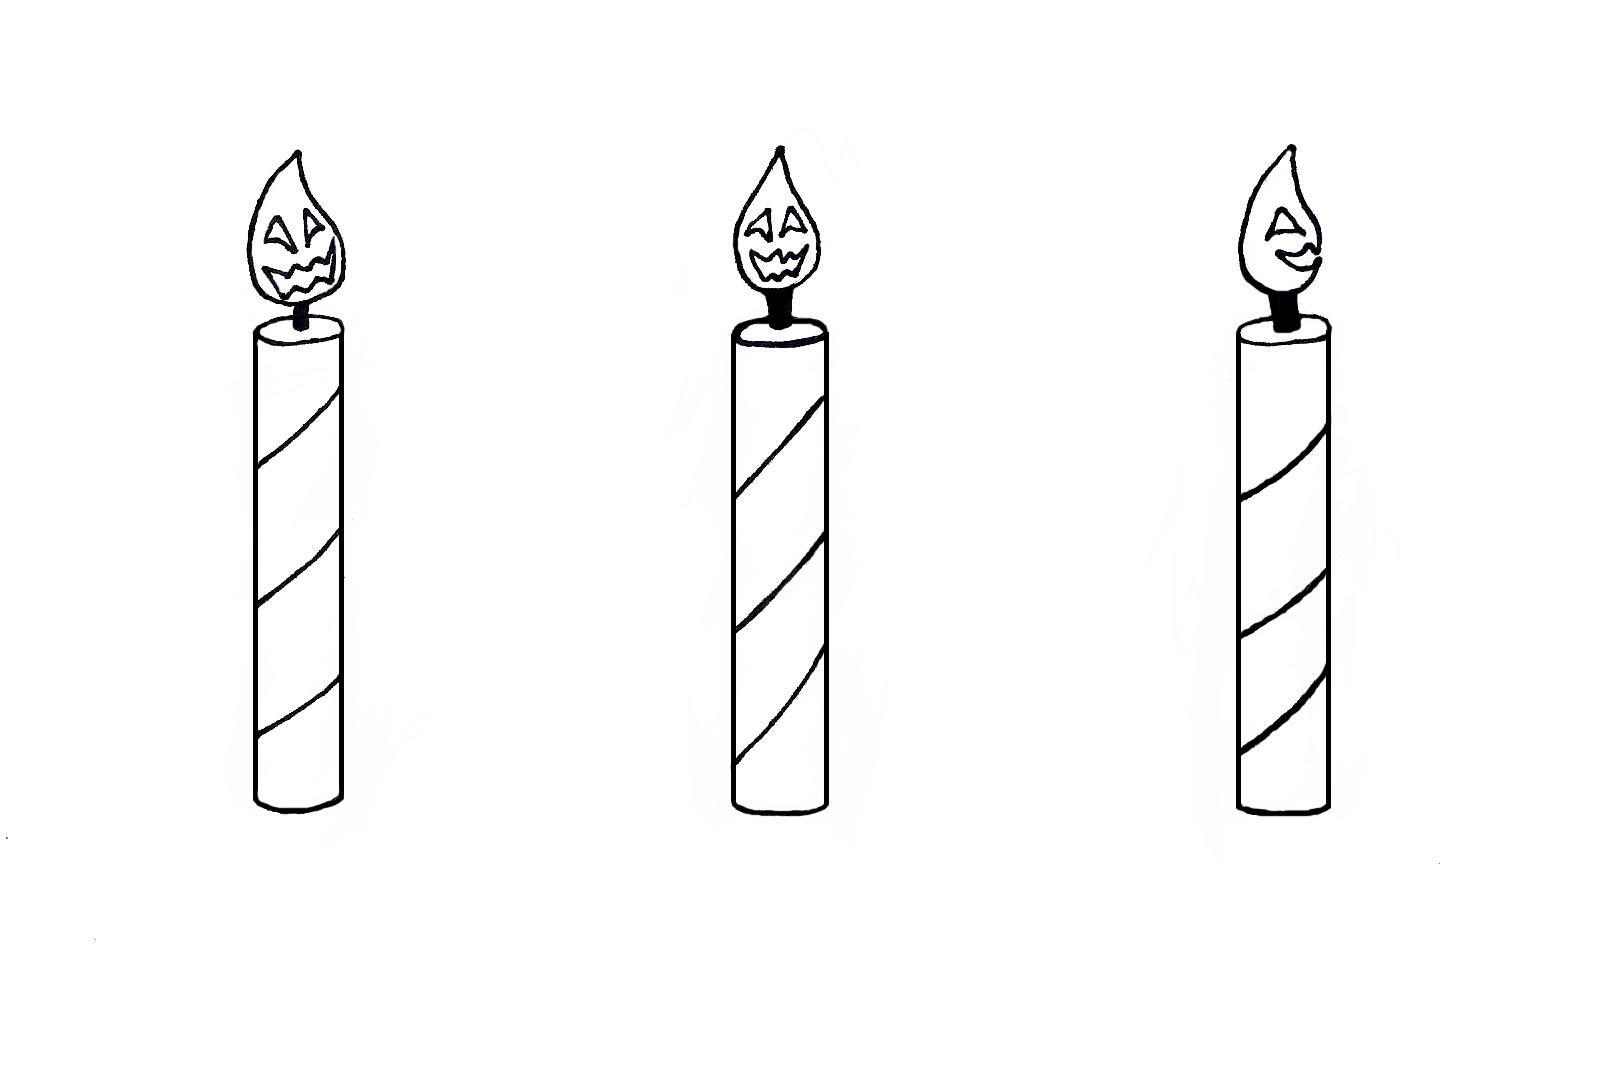 Candle_Rotation2